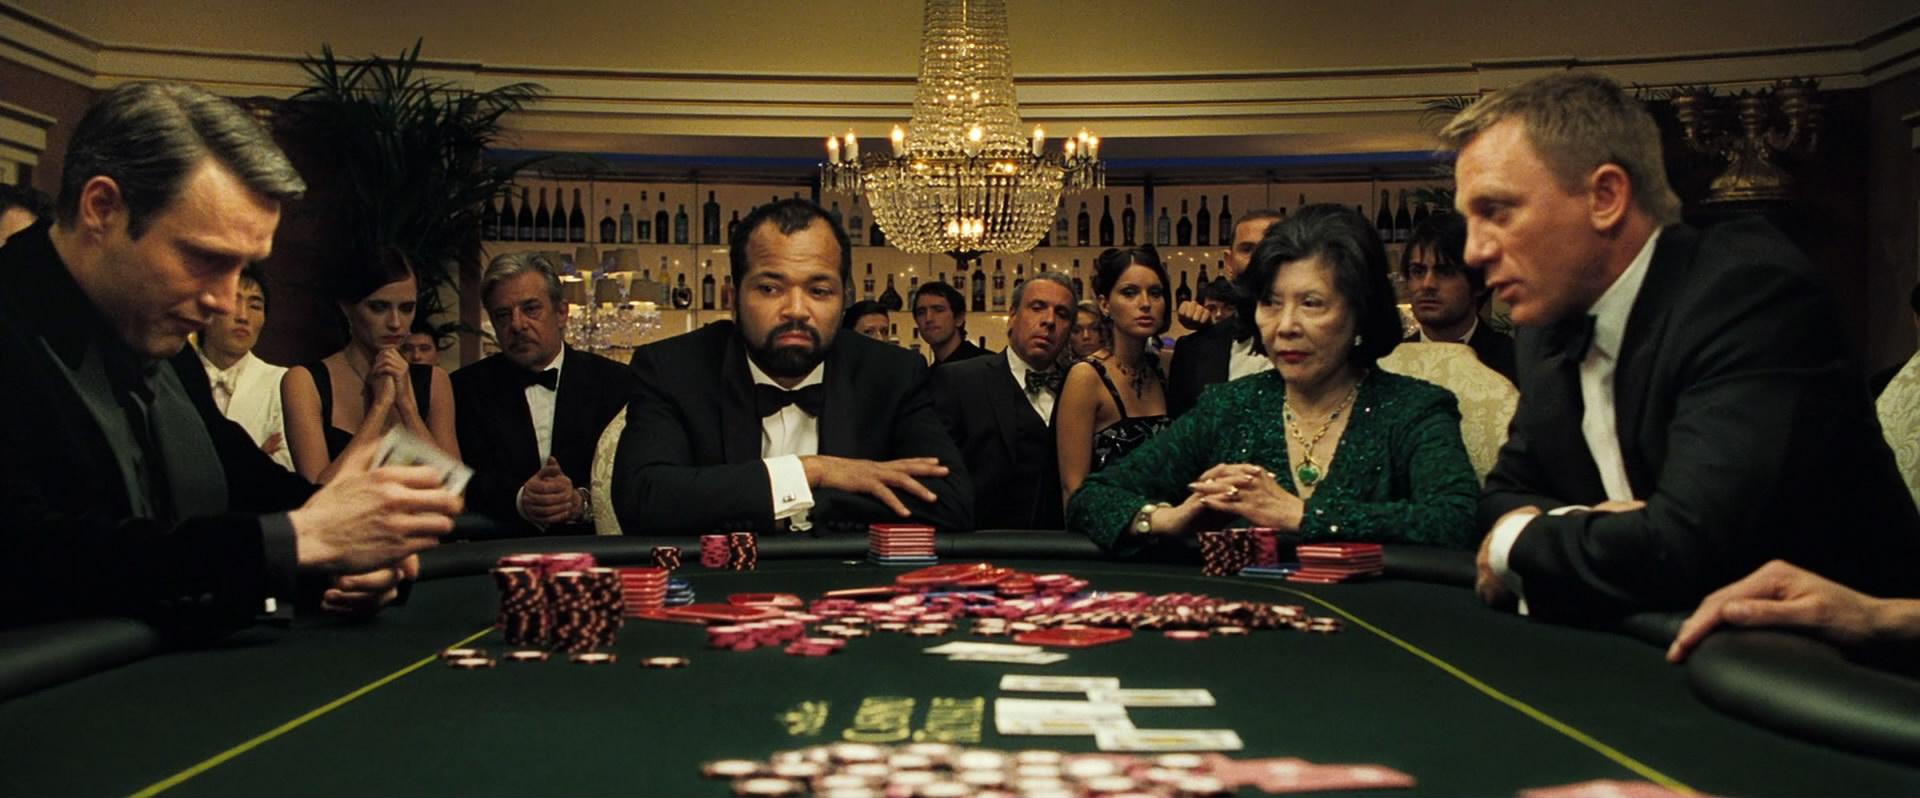 Casino royale buzzer free texas holdem casino games